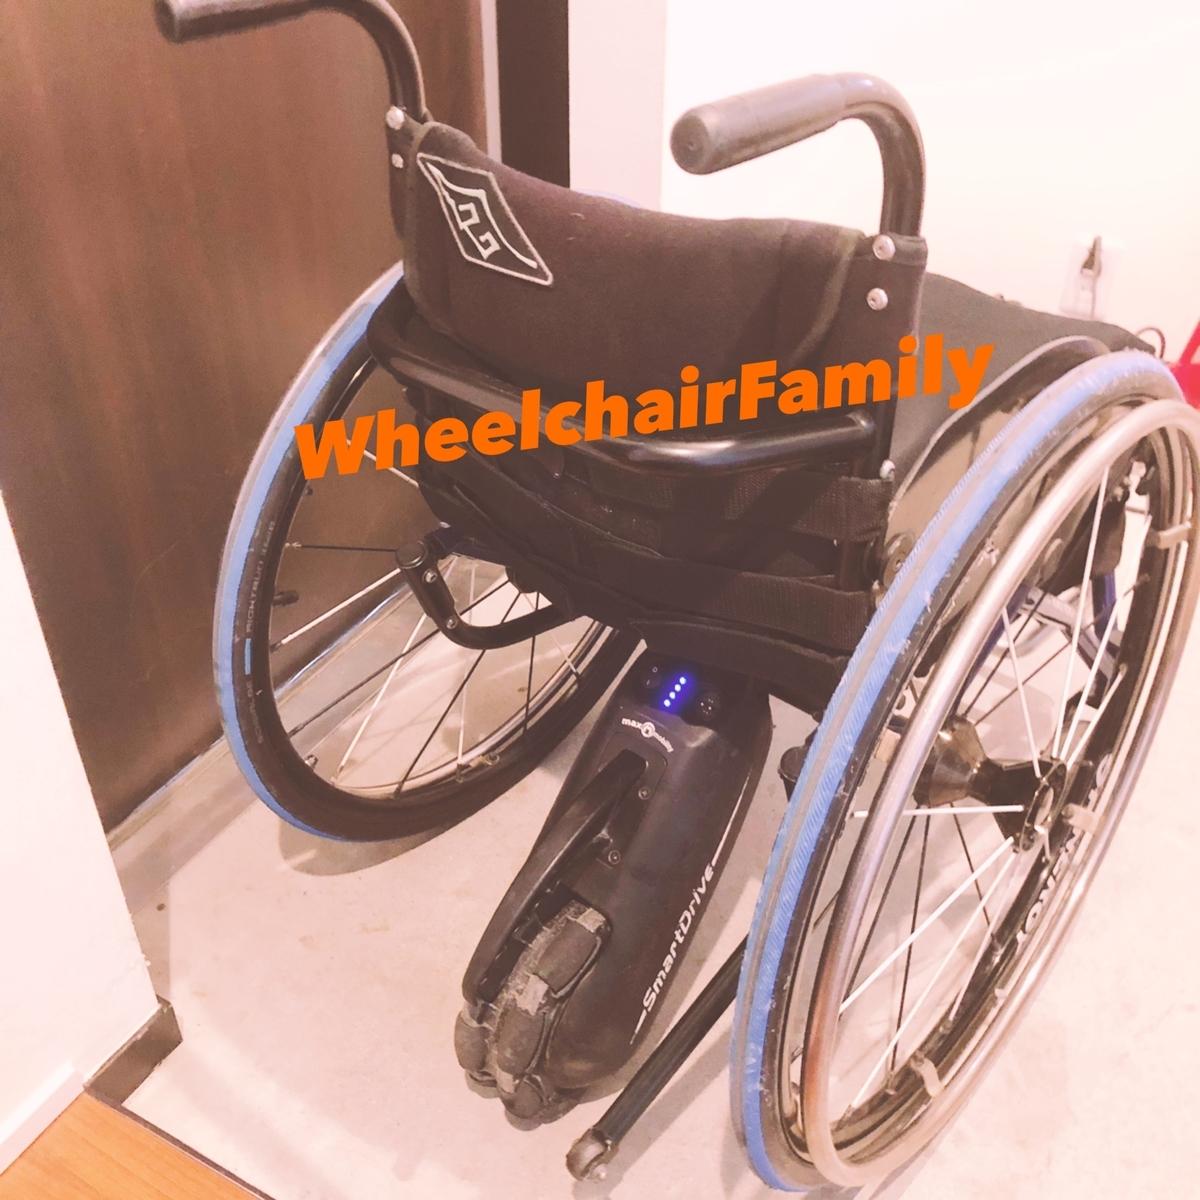 f:id:WheelchairFamily:20190902110217j:plain